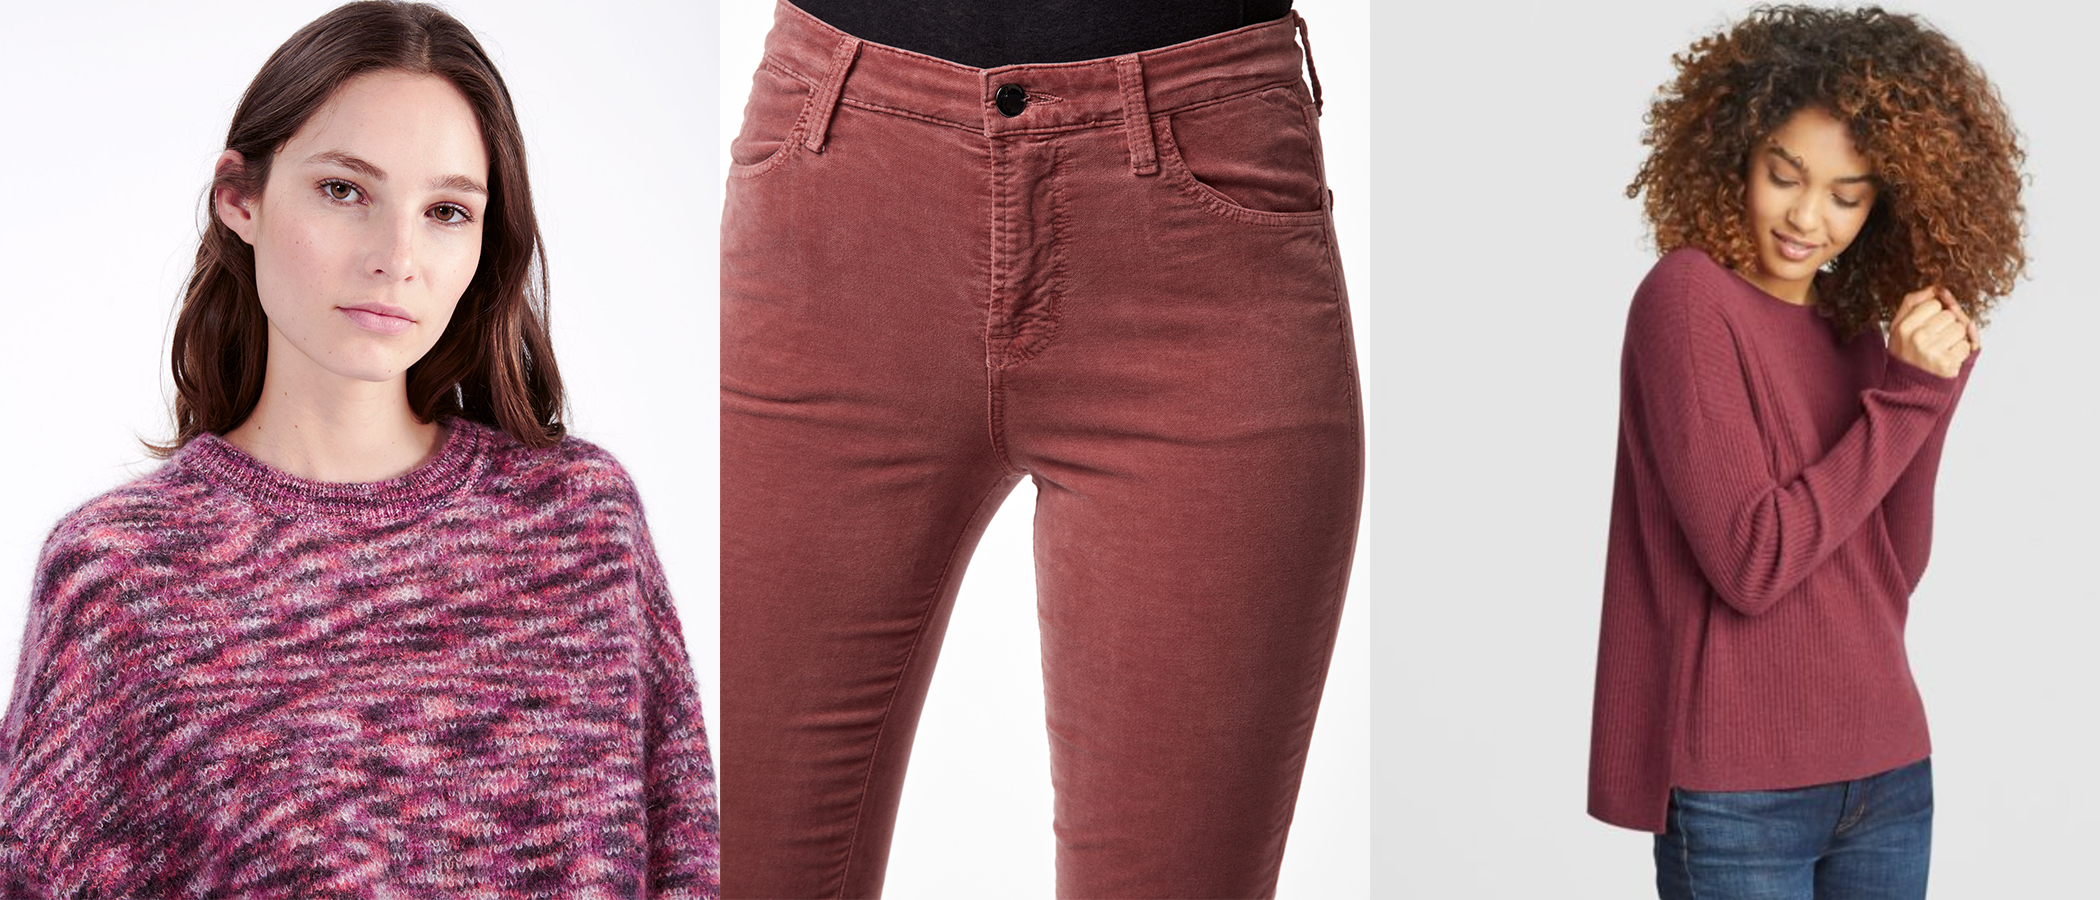 (L to R: IRO Sweater, J Brand Velveteen Skinny Jean, Eileen Fisher Cashmere Sweater)